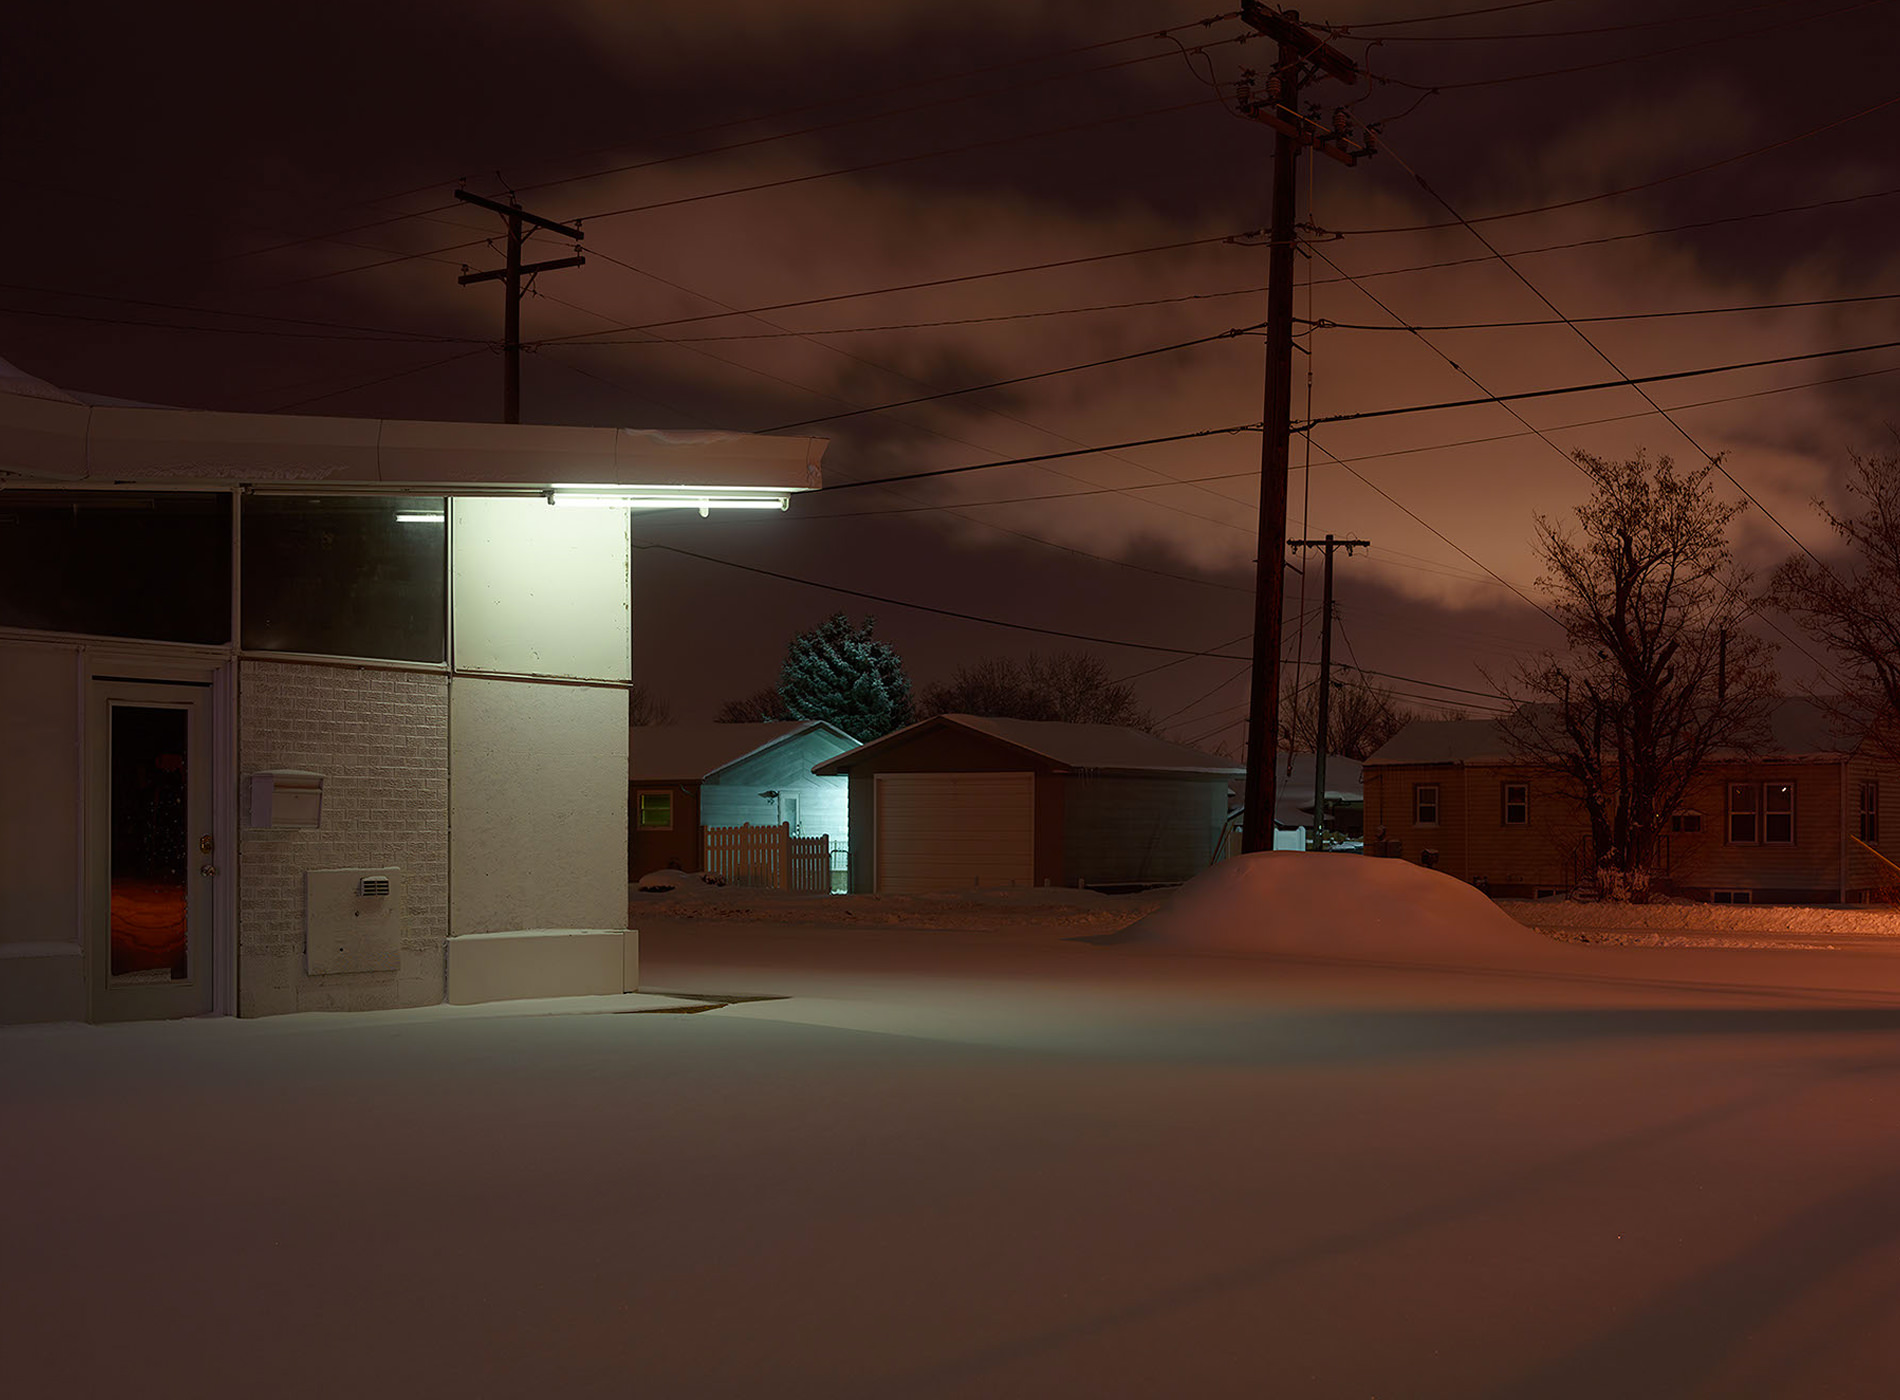 Photographie Josef Hoflehner Roadside America